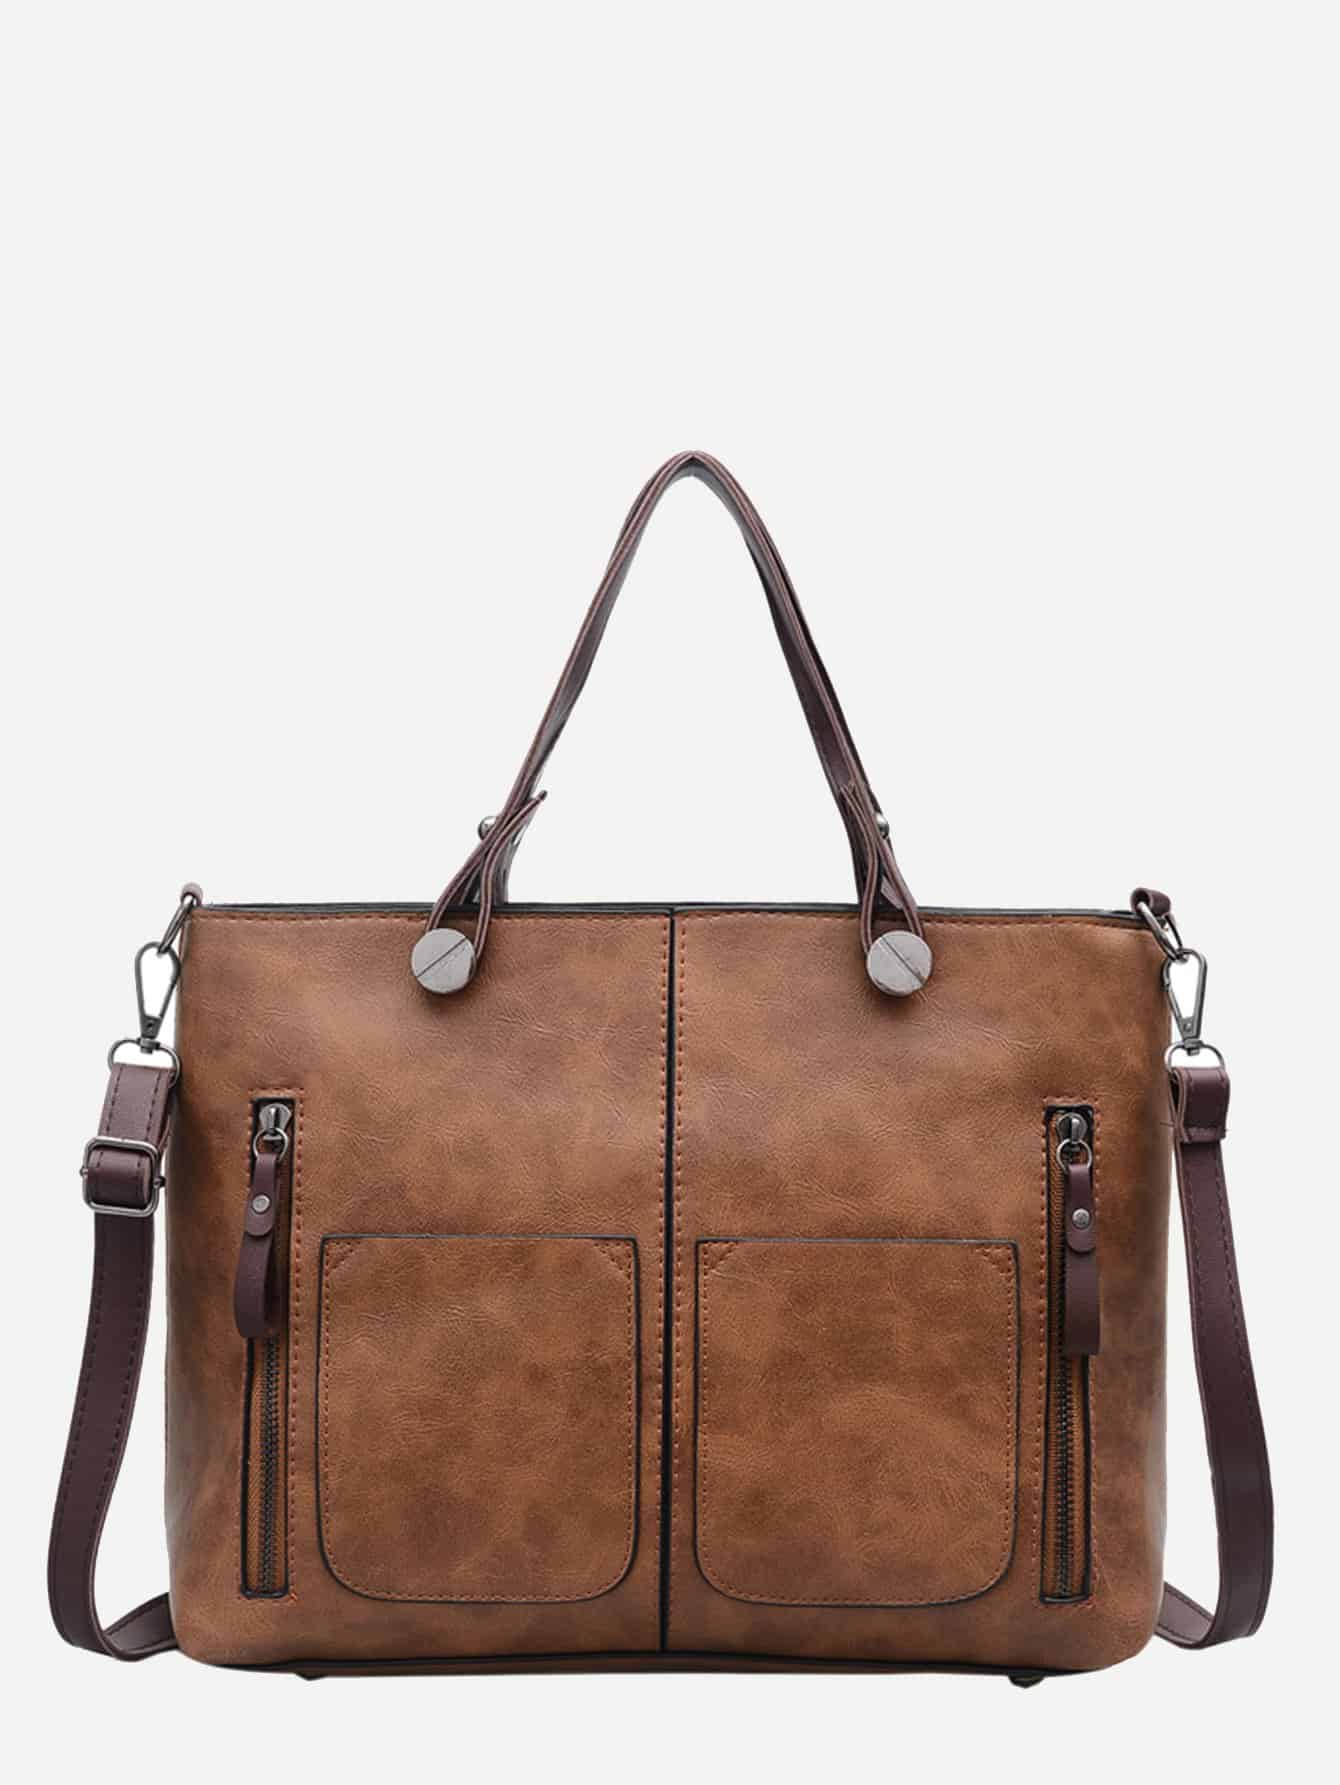 Double Zipper Tote Bag